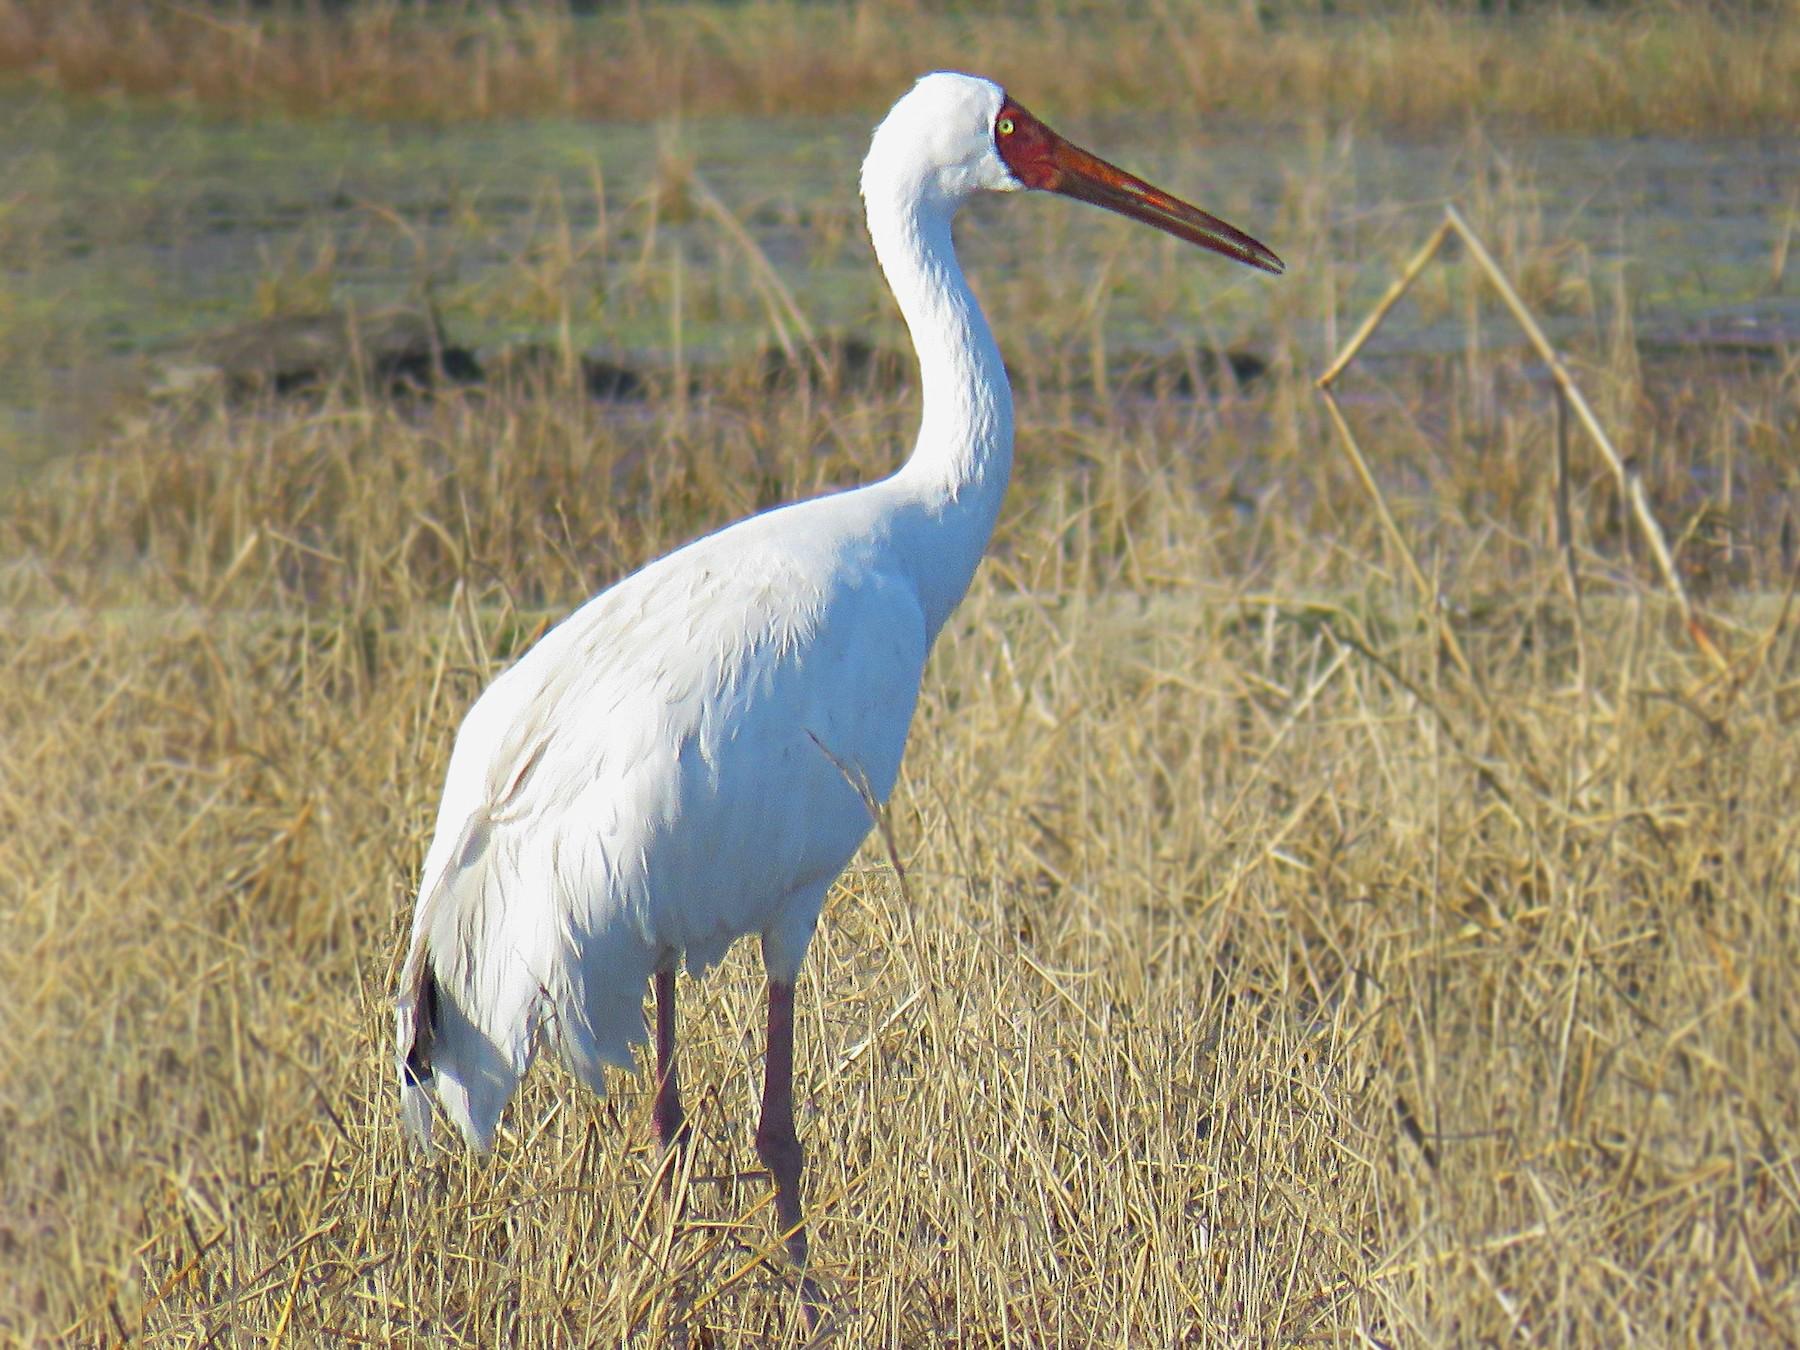 Siberian Crane - Malihe Rajabi